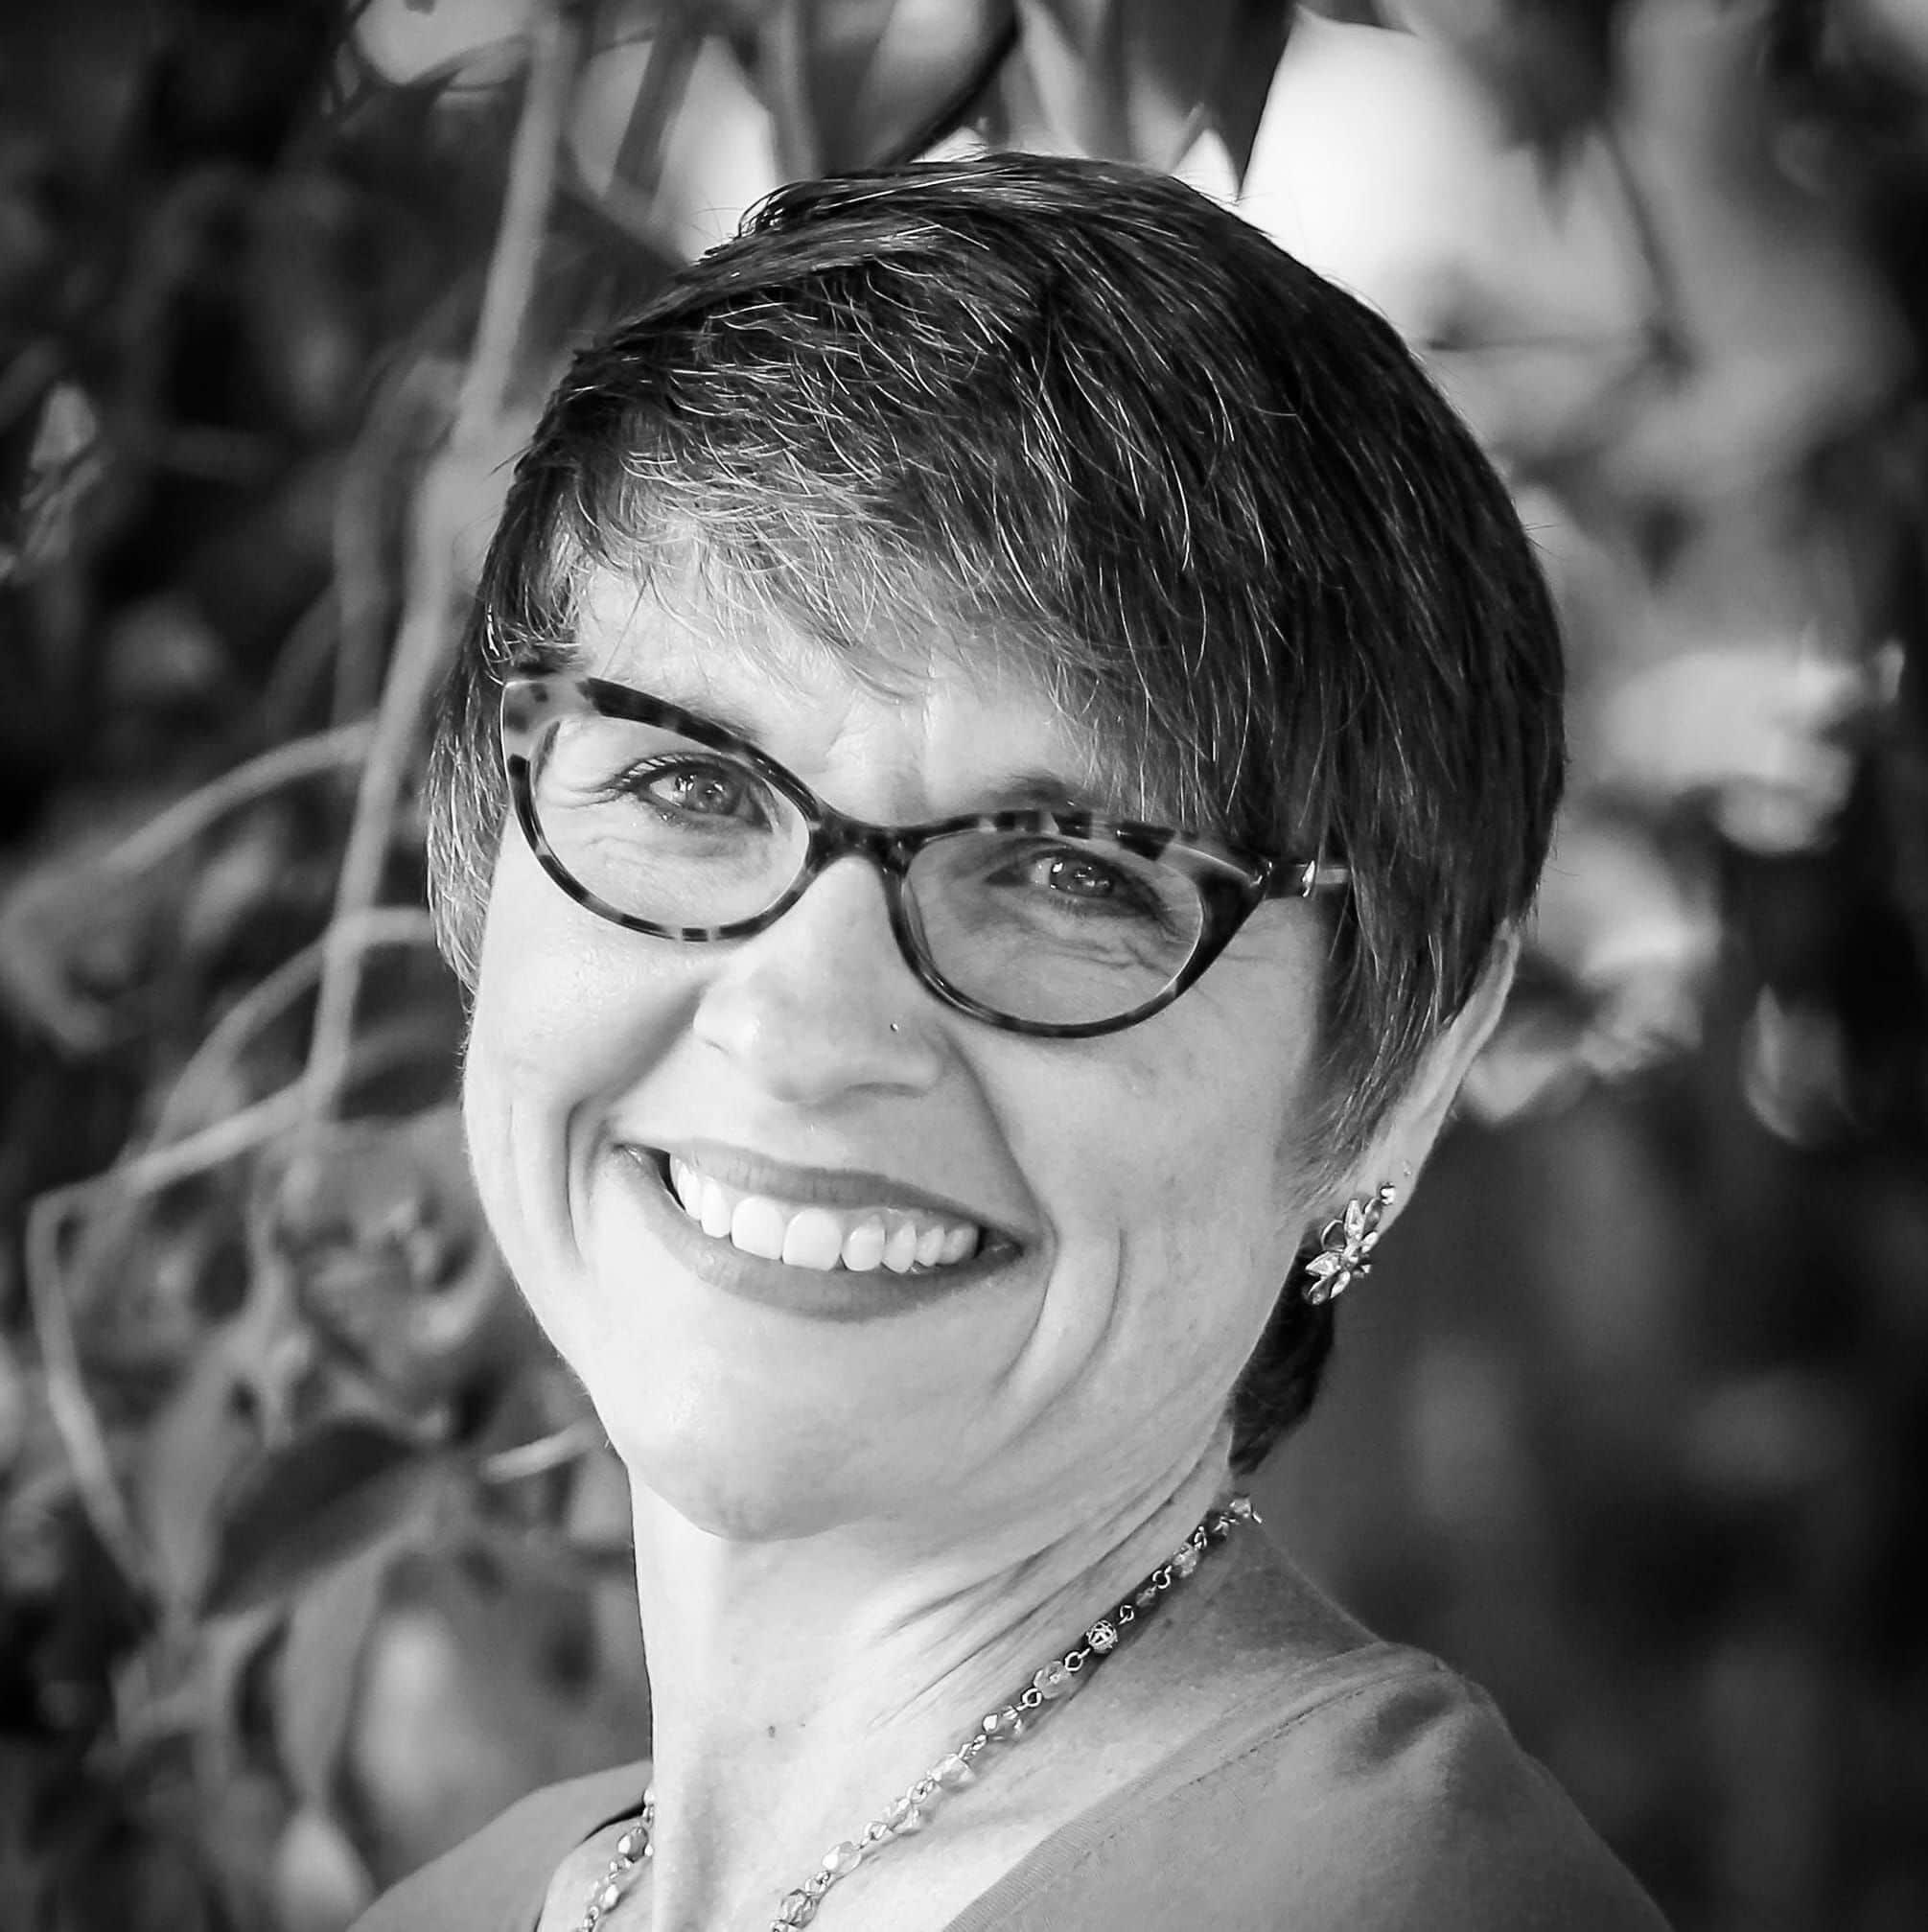 Rachel E. Director of Mobilization